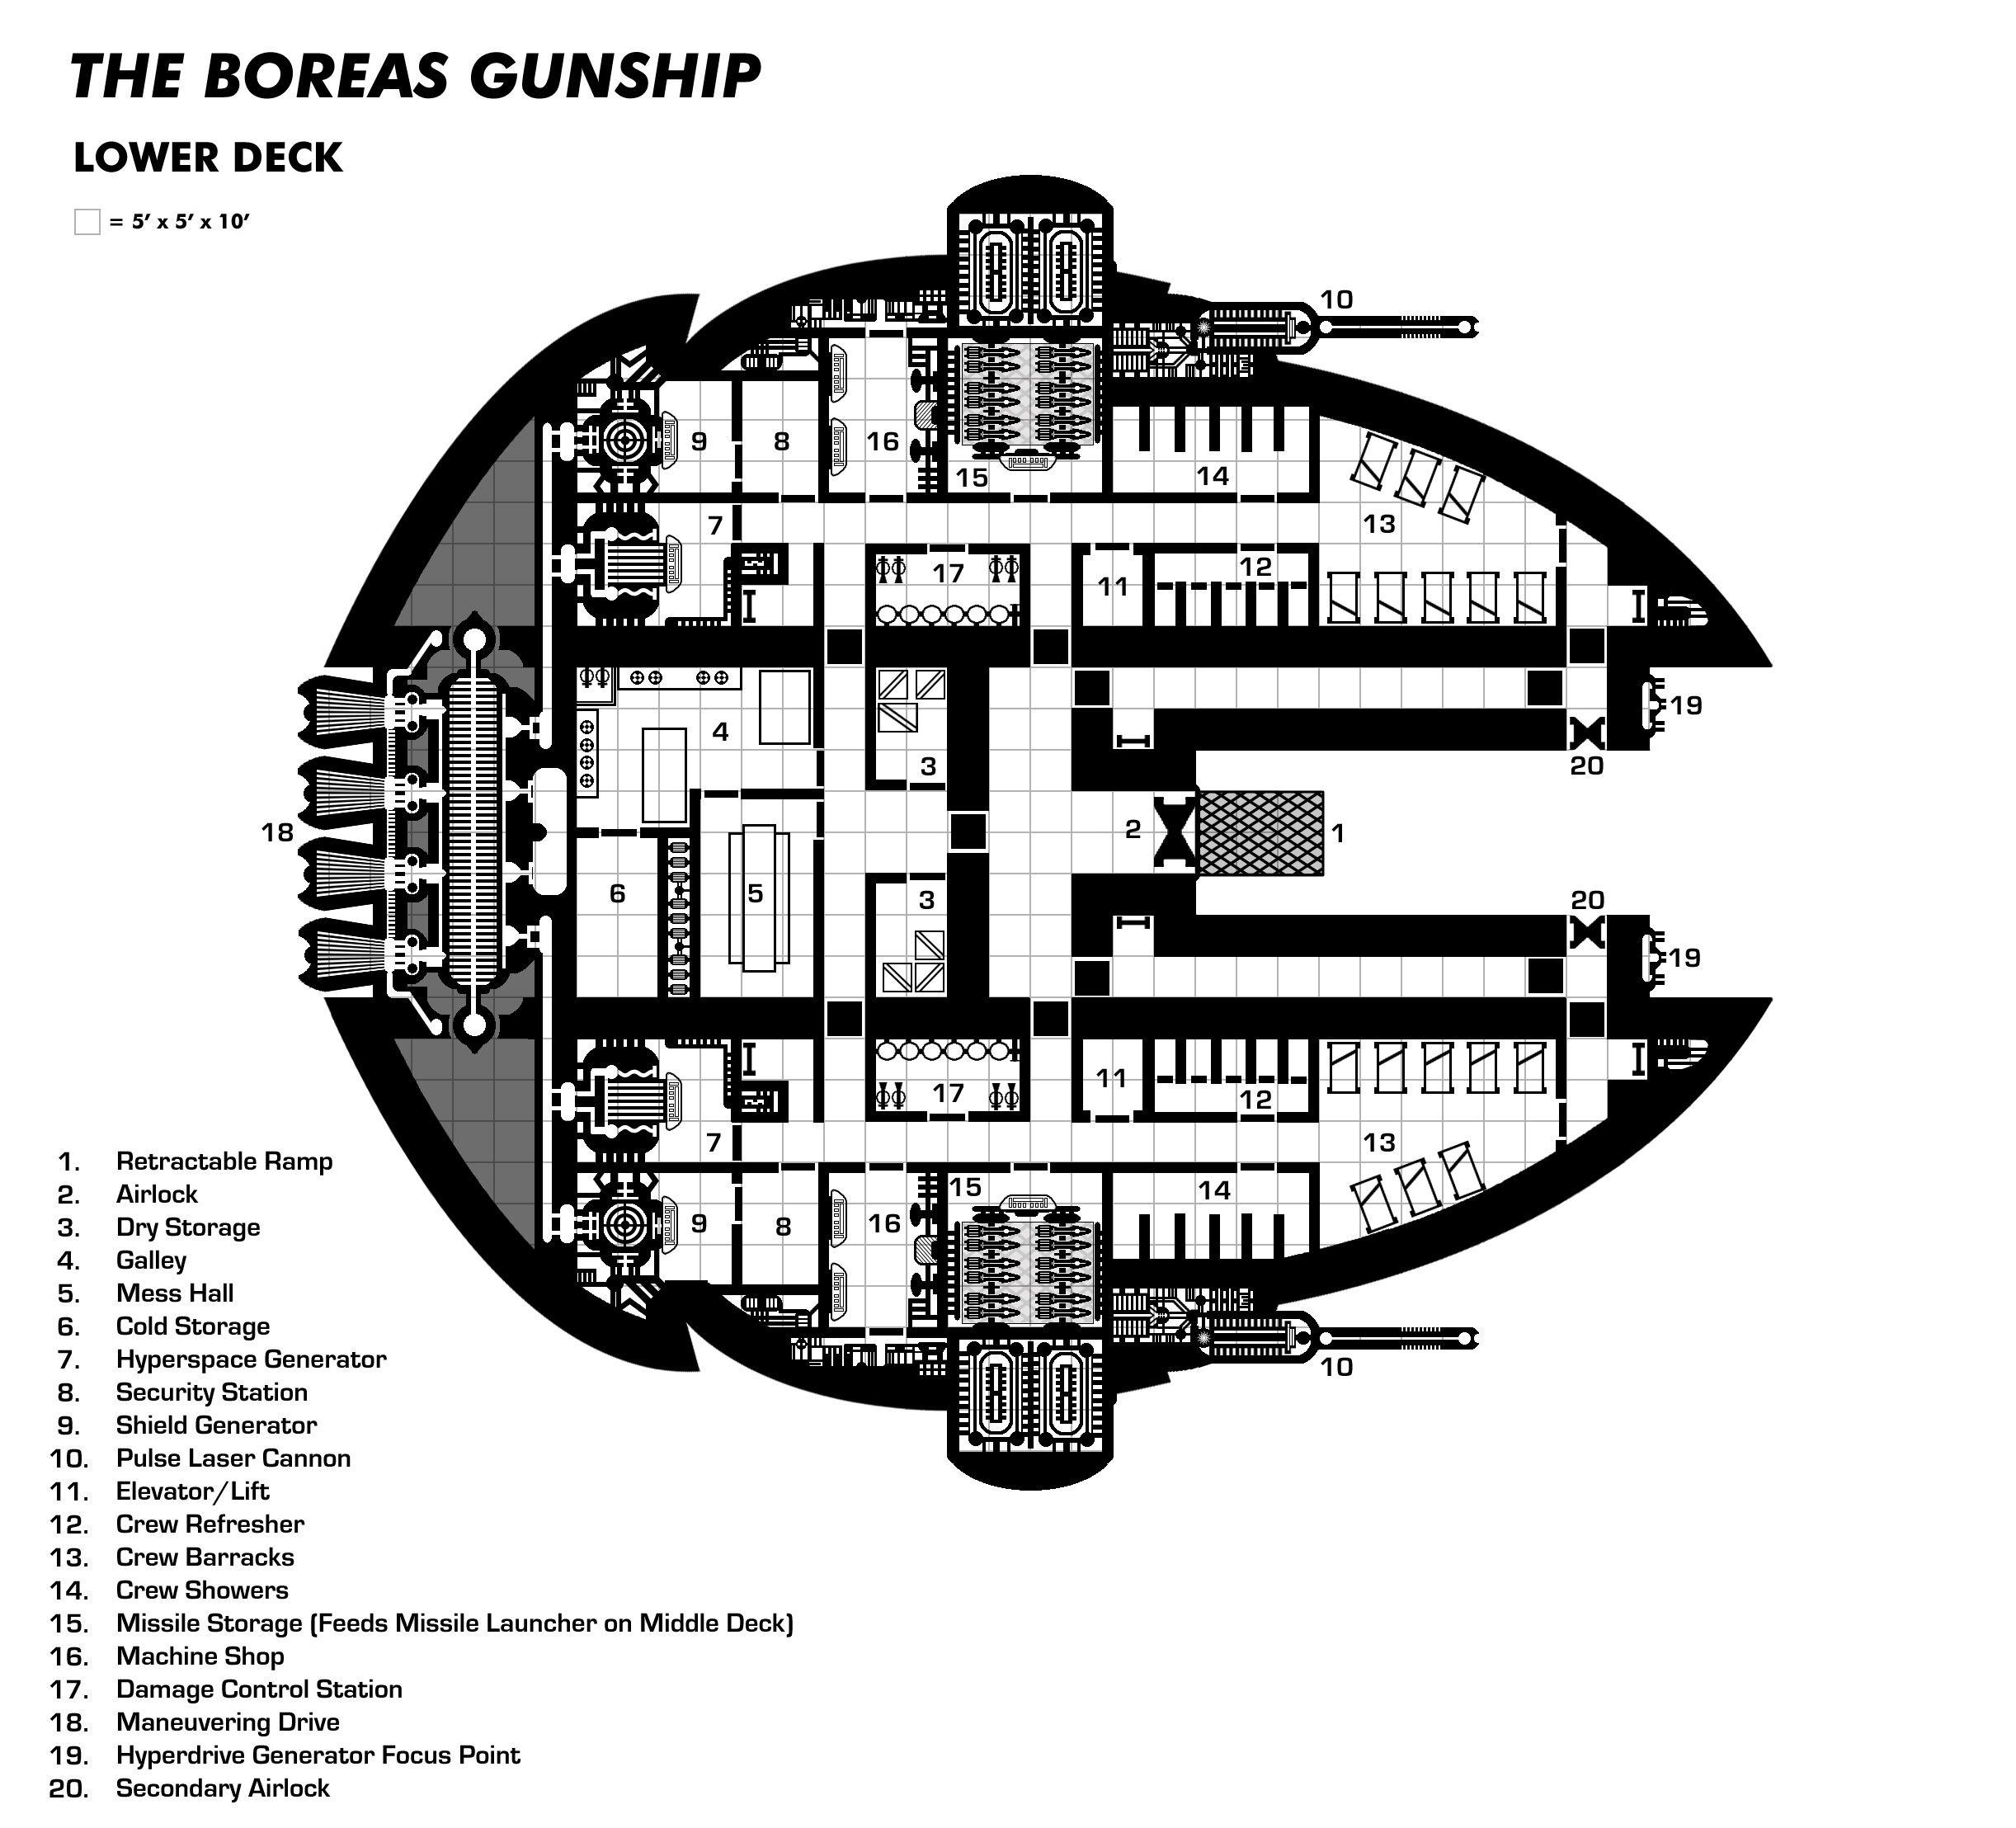 Starship deckplan google search starship deck plans the boreas gunship lower deck baanklon Choice Image